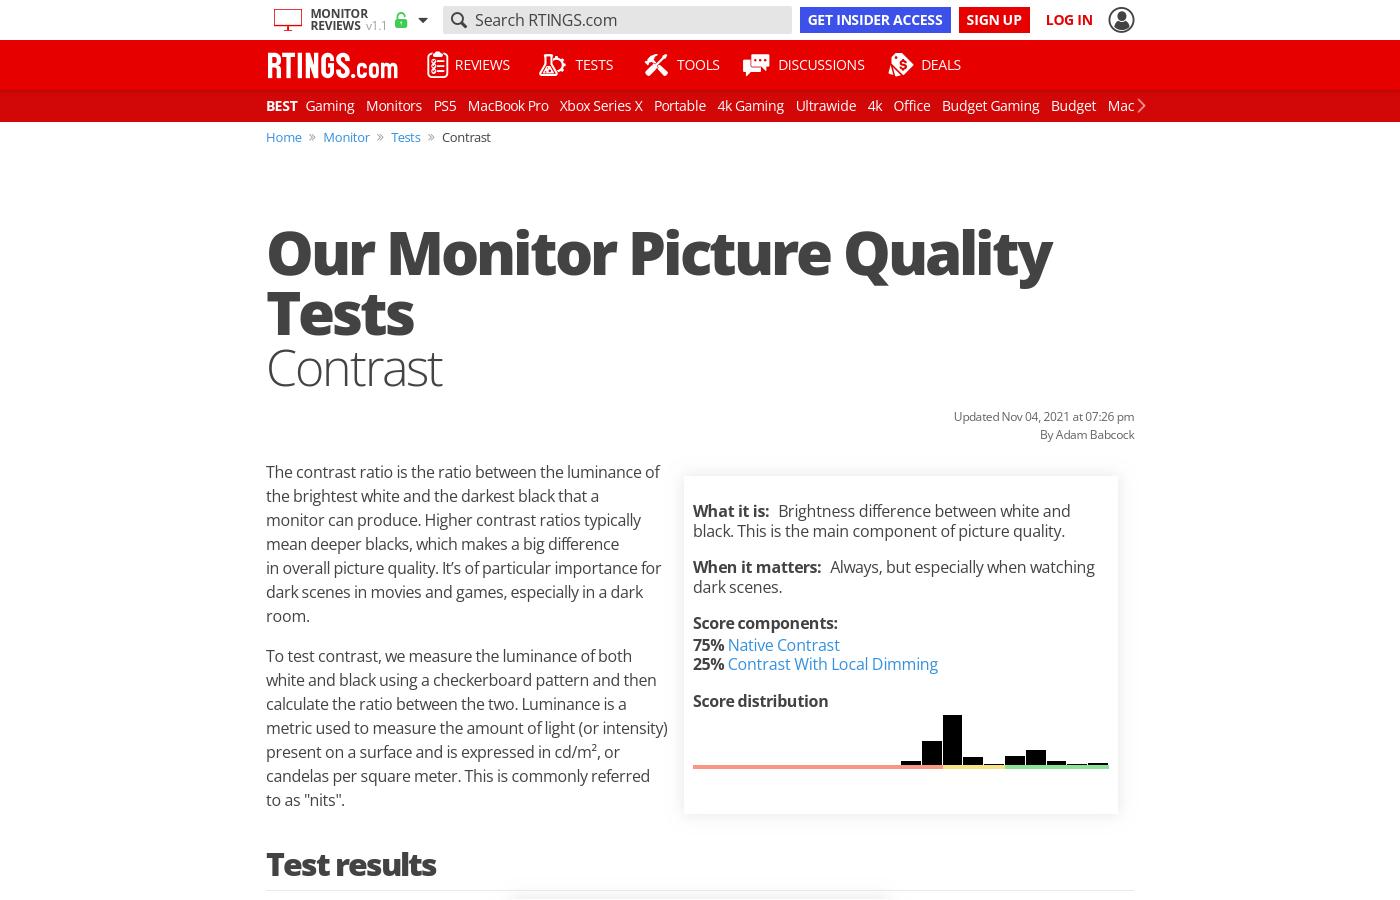 Contrast Ratio of Monitors